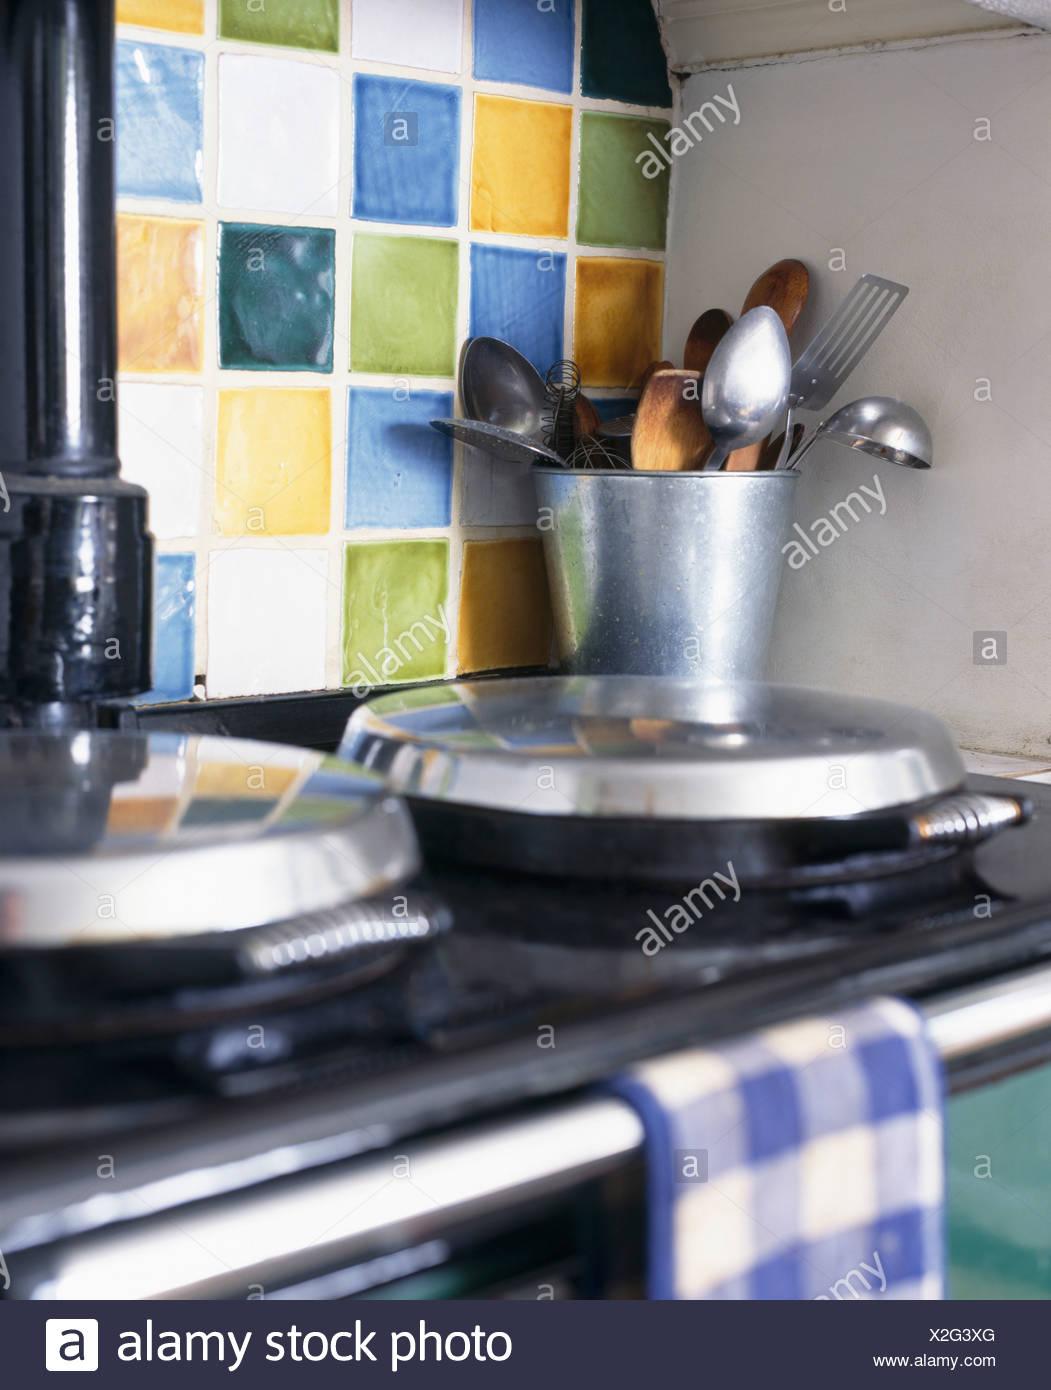 Close-up di utensili da cucina in metallo sulla pentola Aga ...